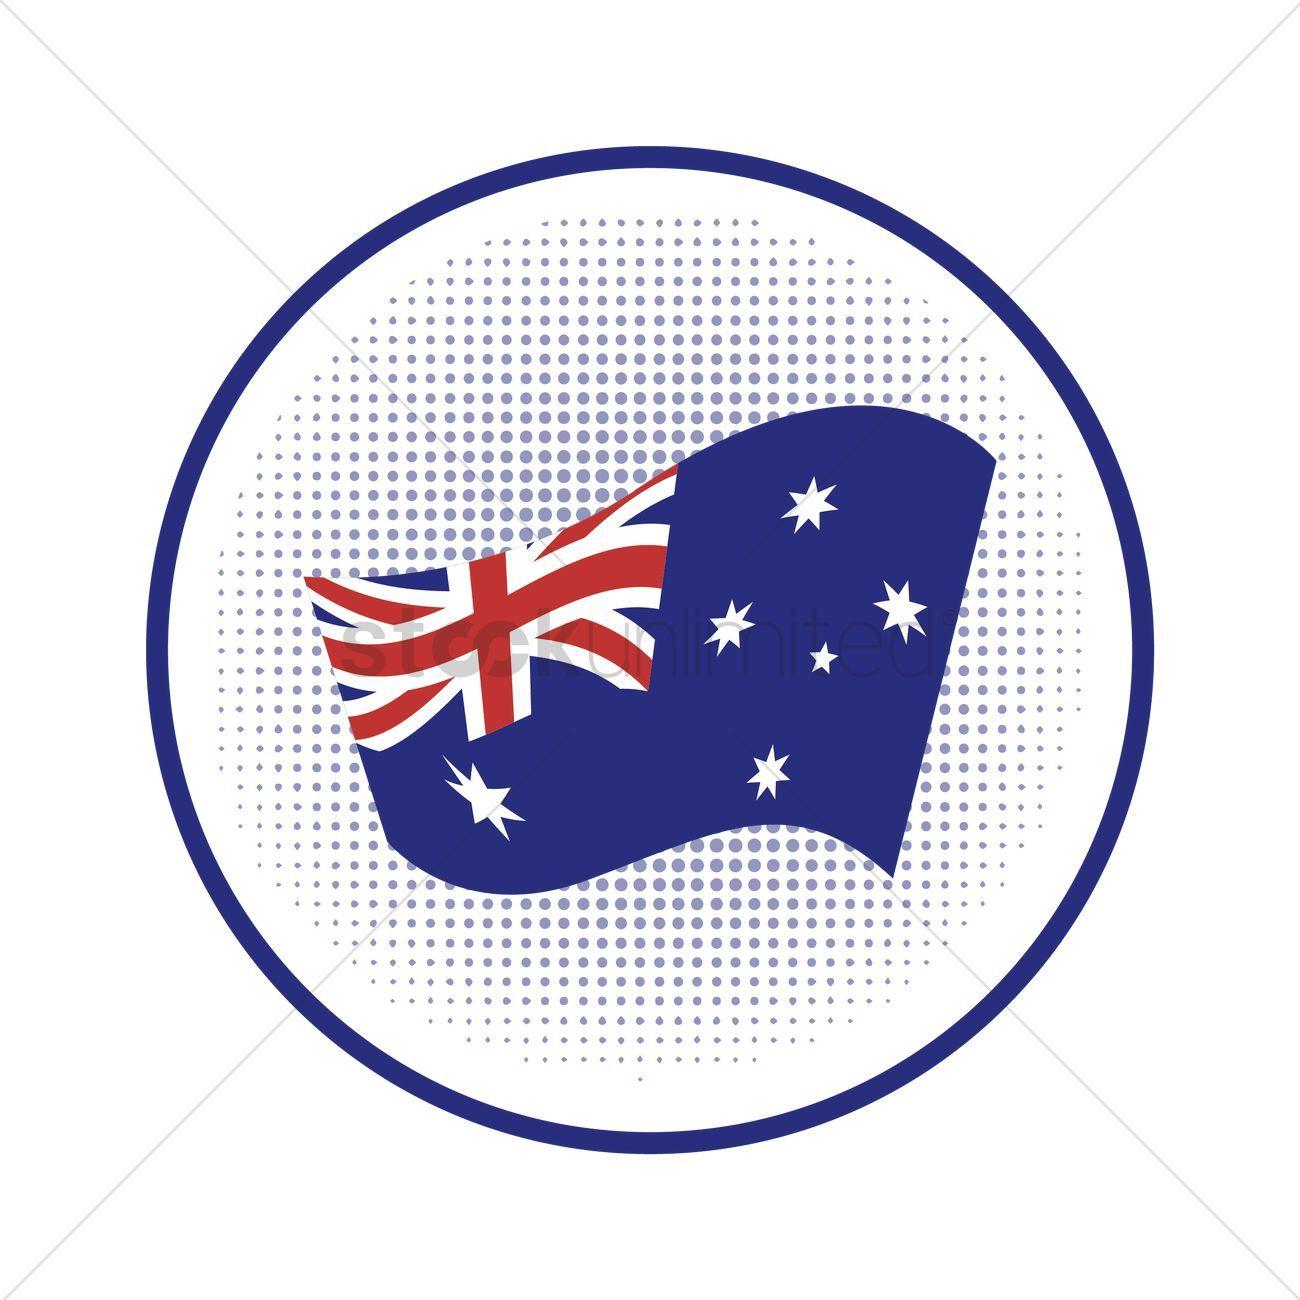 Australia Flag Clipart Black - Flag Of Australia - Png Download (#476546) -  PinClipart